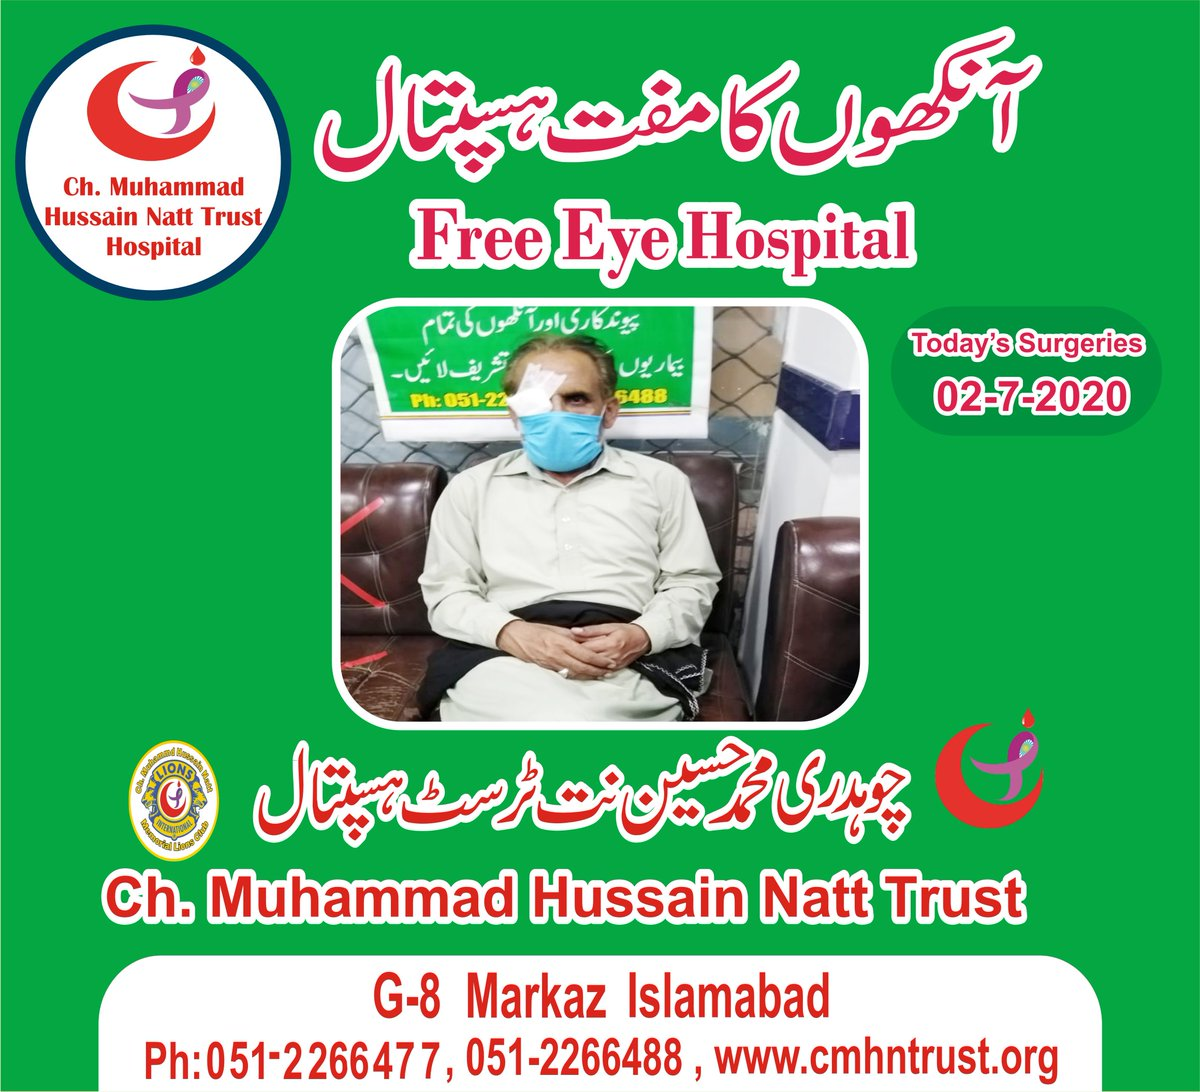 #hospital #Covid_19 #StayHome #Corona #Pakistan #Cataract #donation #eyes #ngo #Forbes #BreakingNews #Madinah #Makkah #Lahore #Karachi #dubai #العدالة_للطفل_السوري https://t.co/ttnqJQXrIa